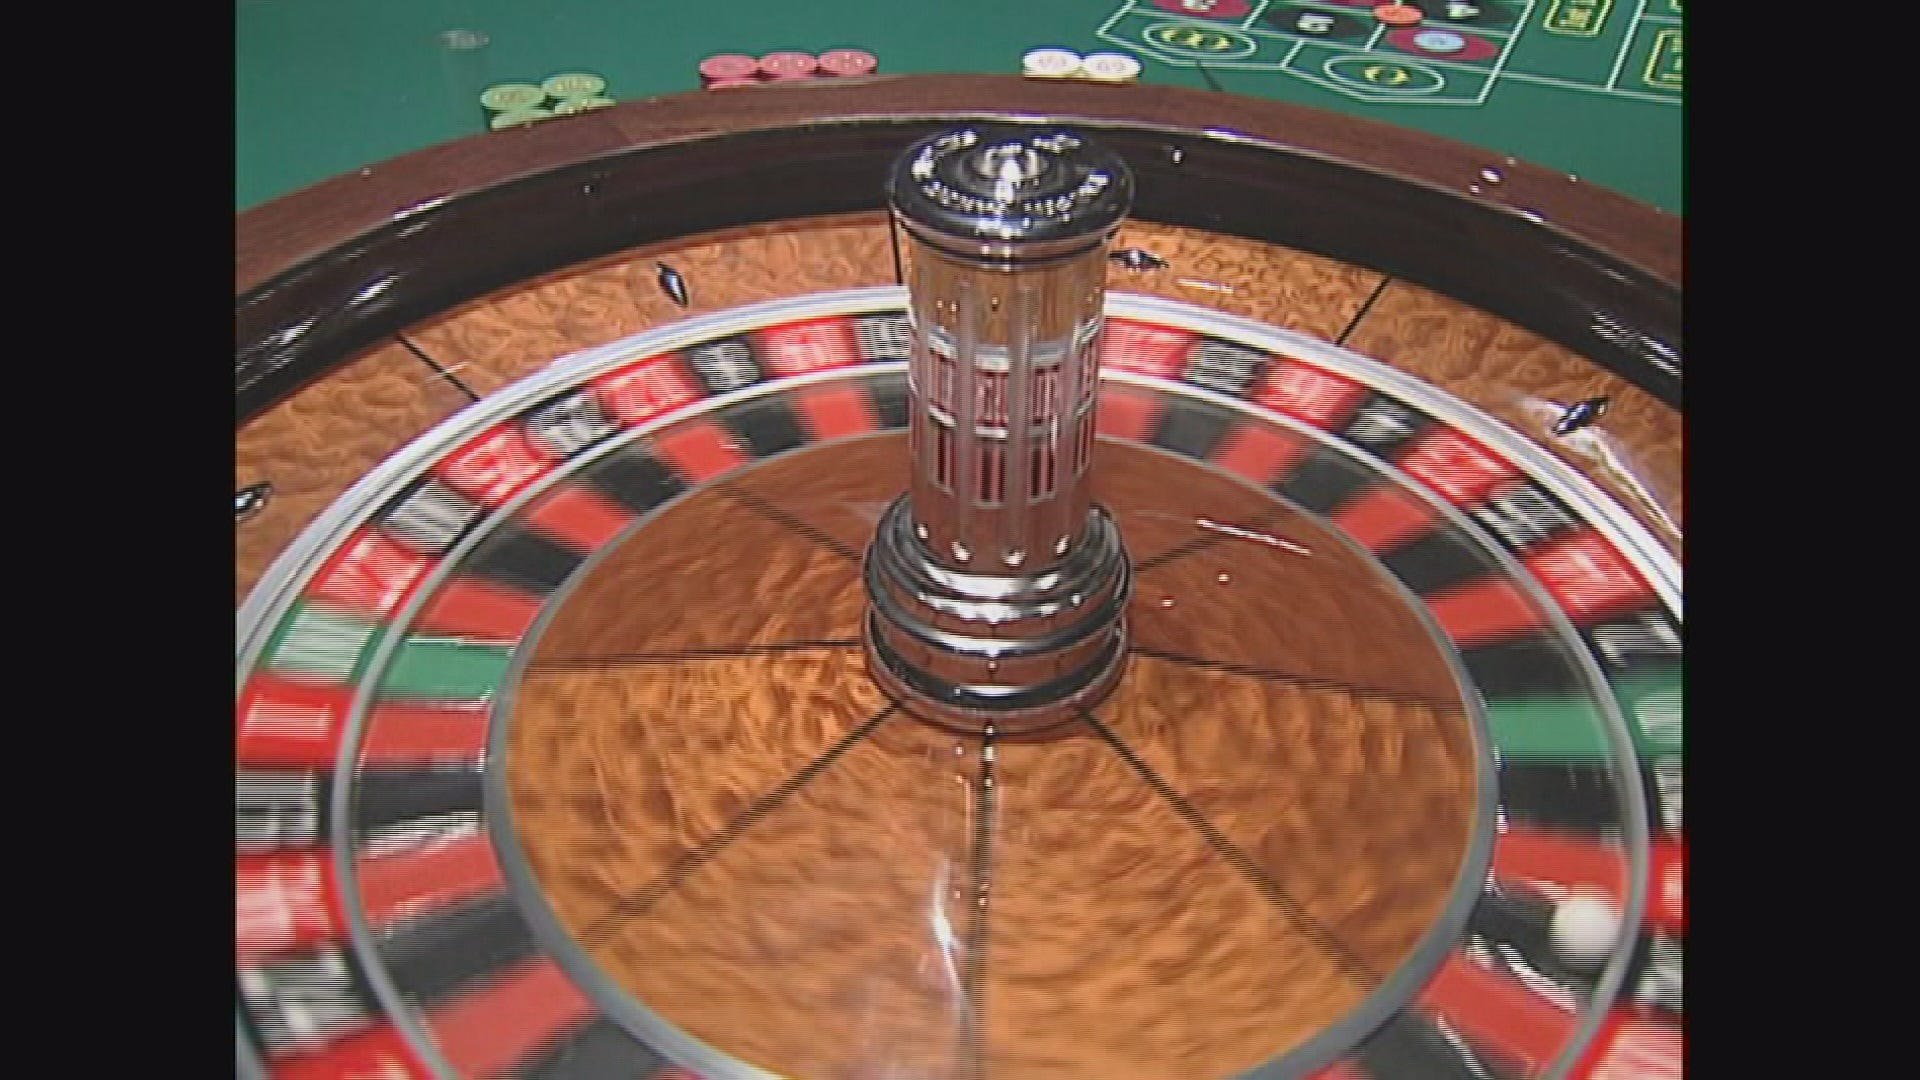 Seneca poker niagara falls schedule manually eject slot load dvd drive